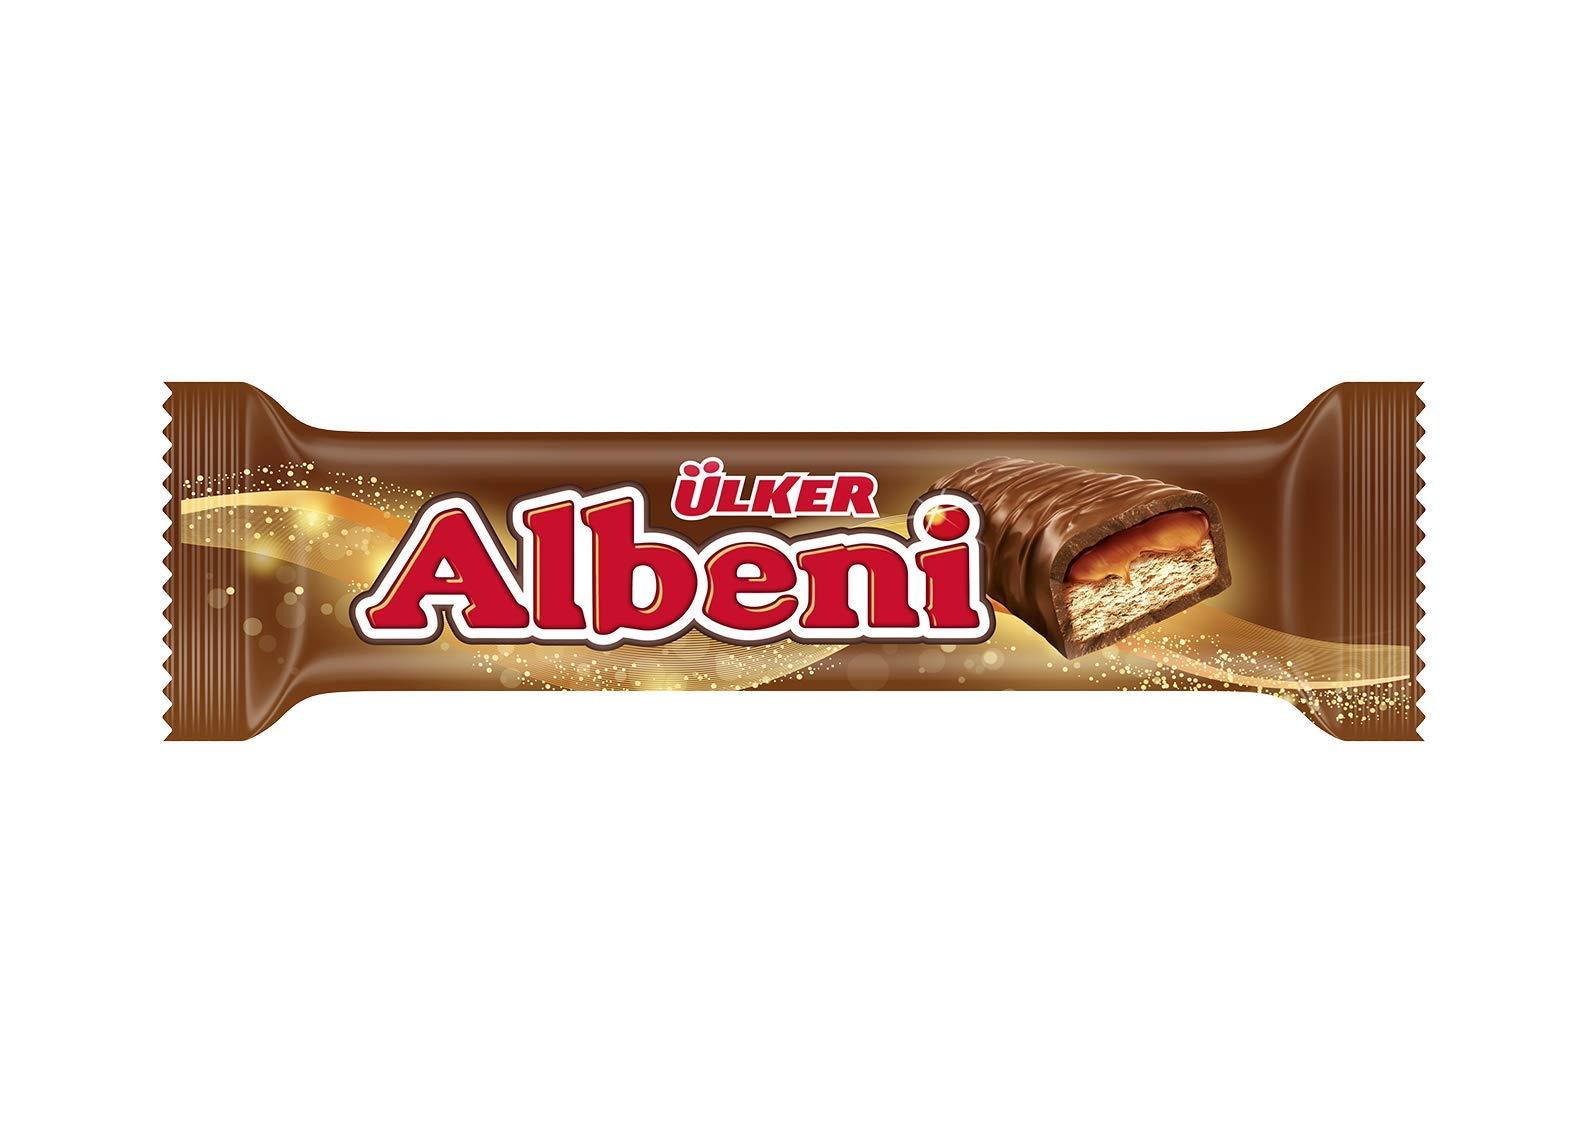 Ülker Albeni Milk Chocolate Coated Bar w/ Caramel & Biscuit 40g